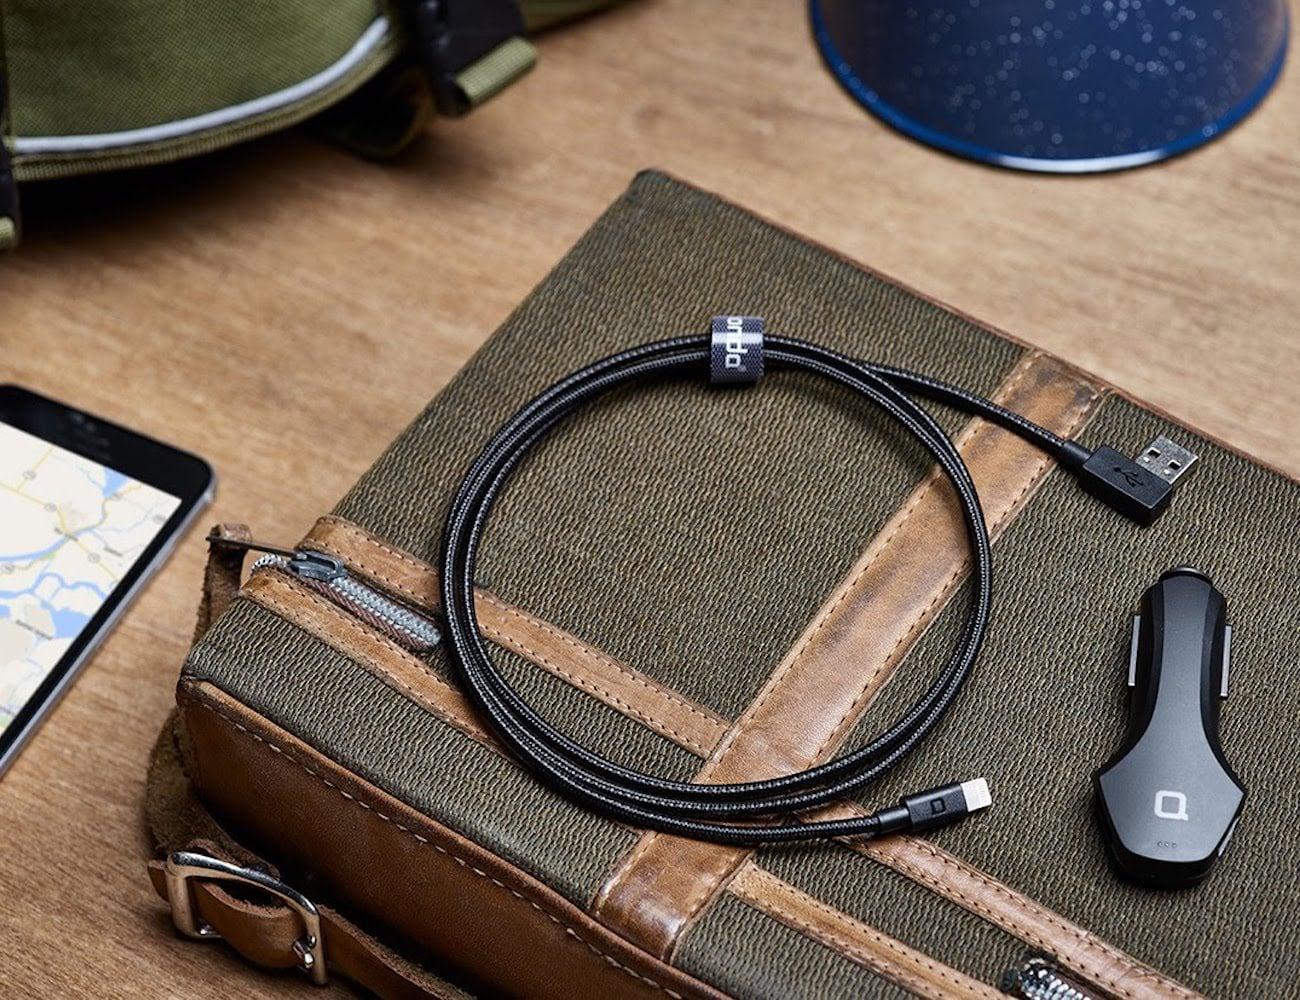 nonda ZUS USB A Micro USB Kevlar Cable